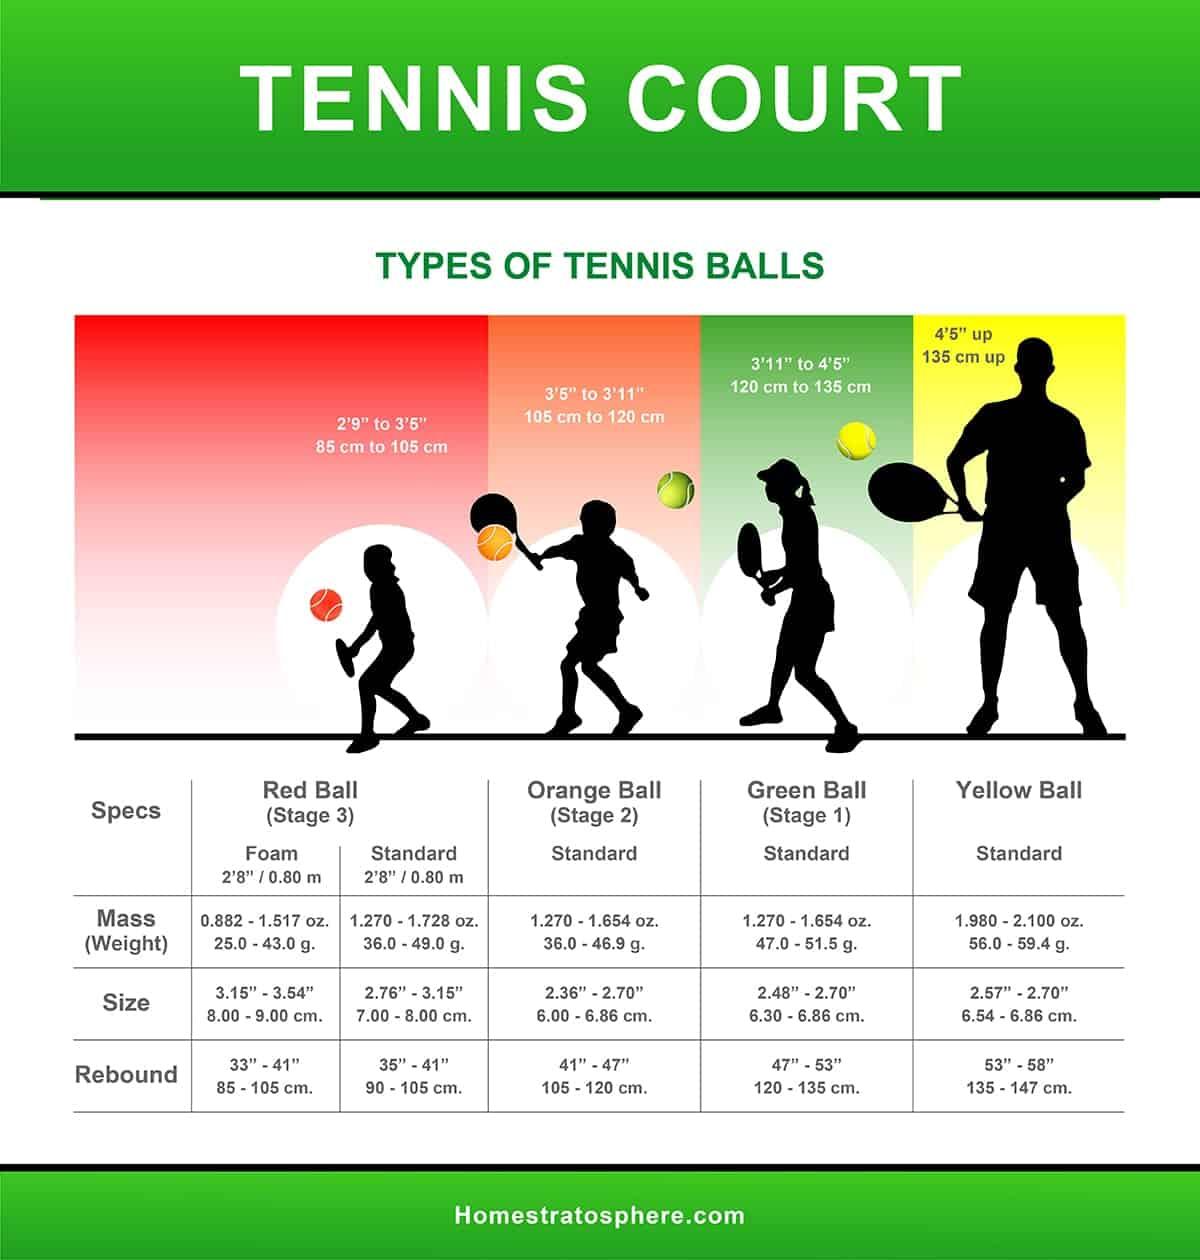 Types of tennis balls chart